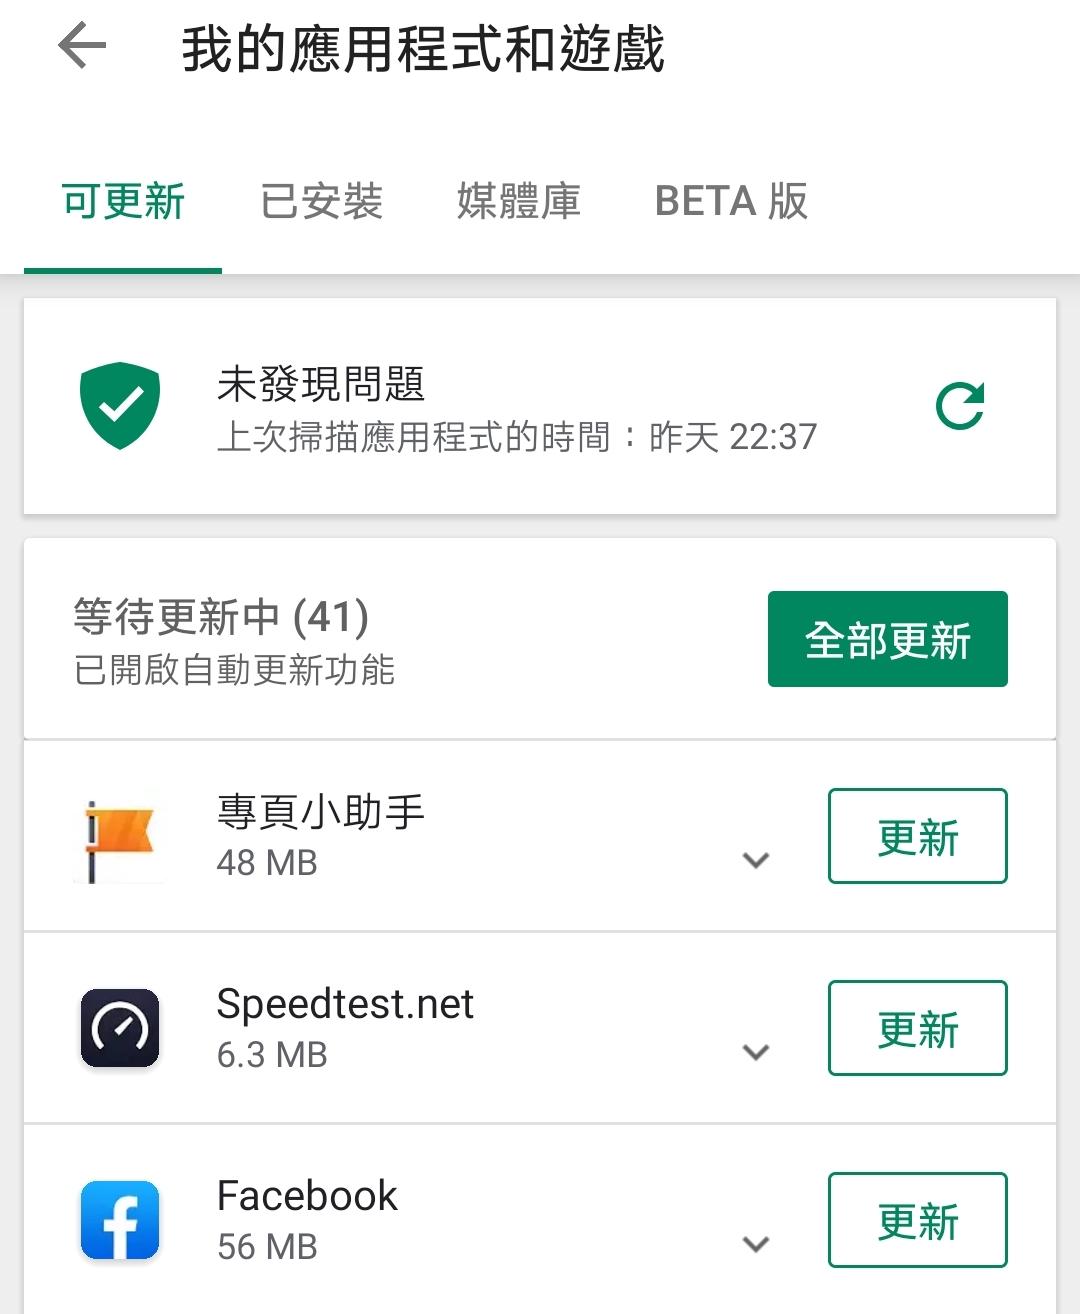 Google Play 商店無法自動更新與下載 APP 該怎麼辦